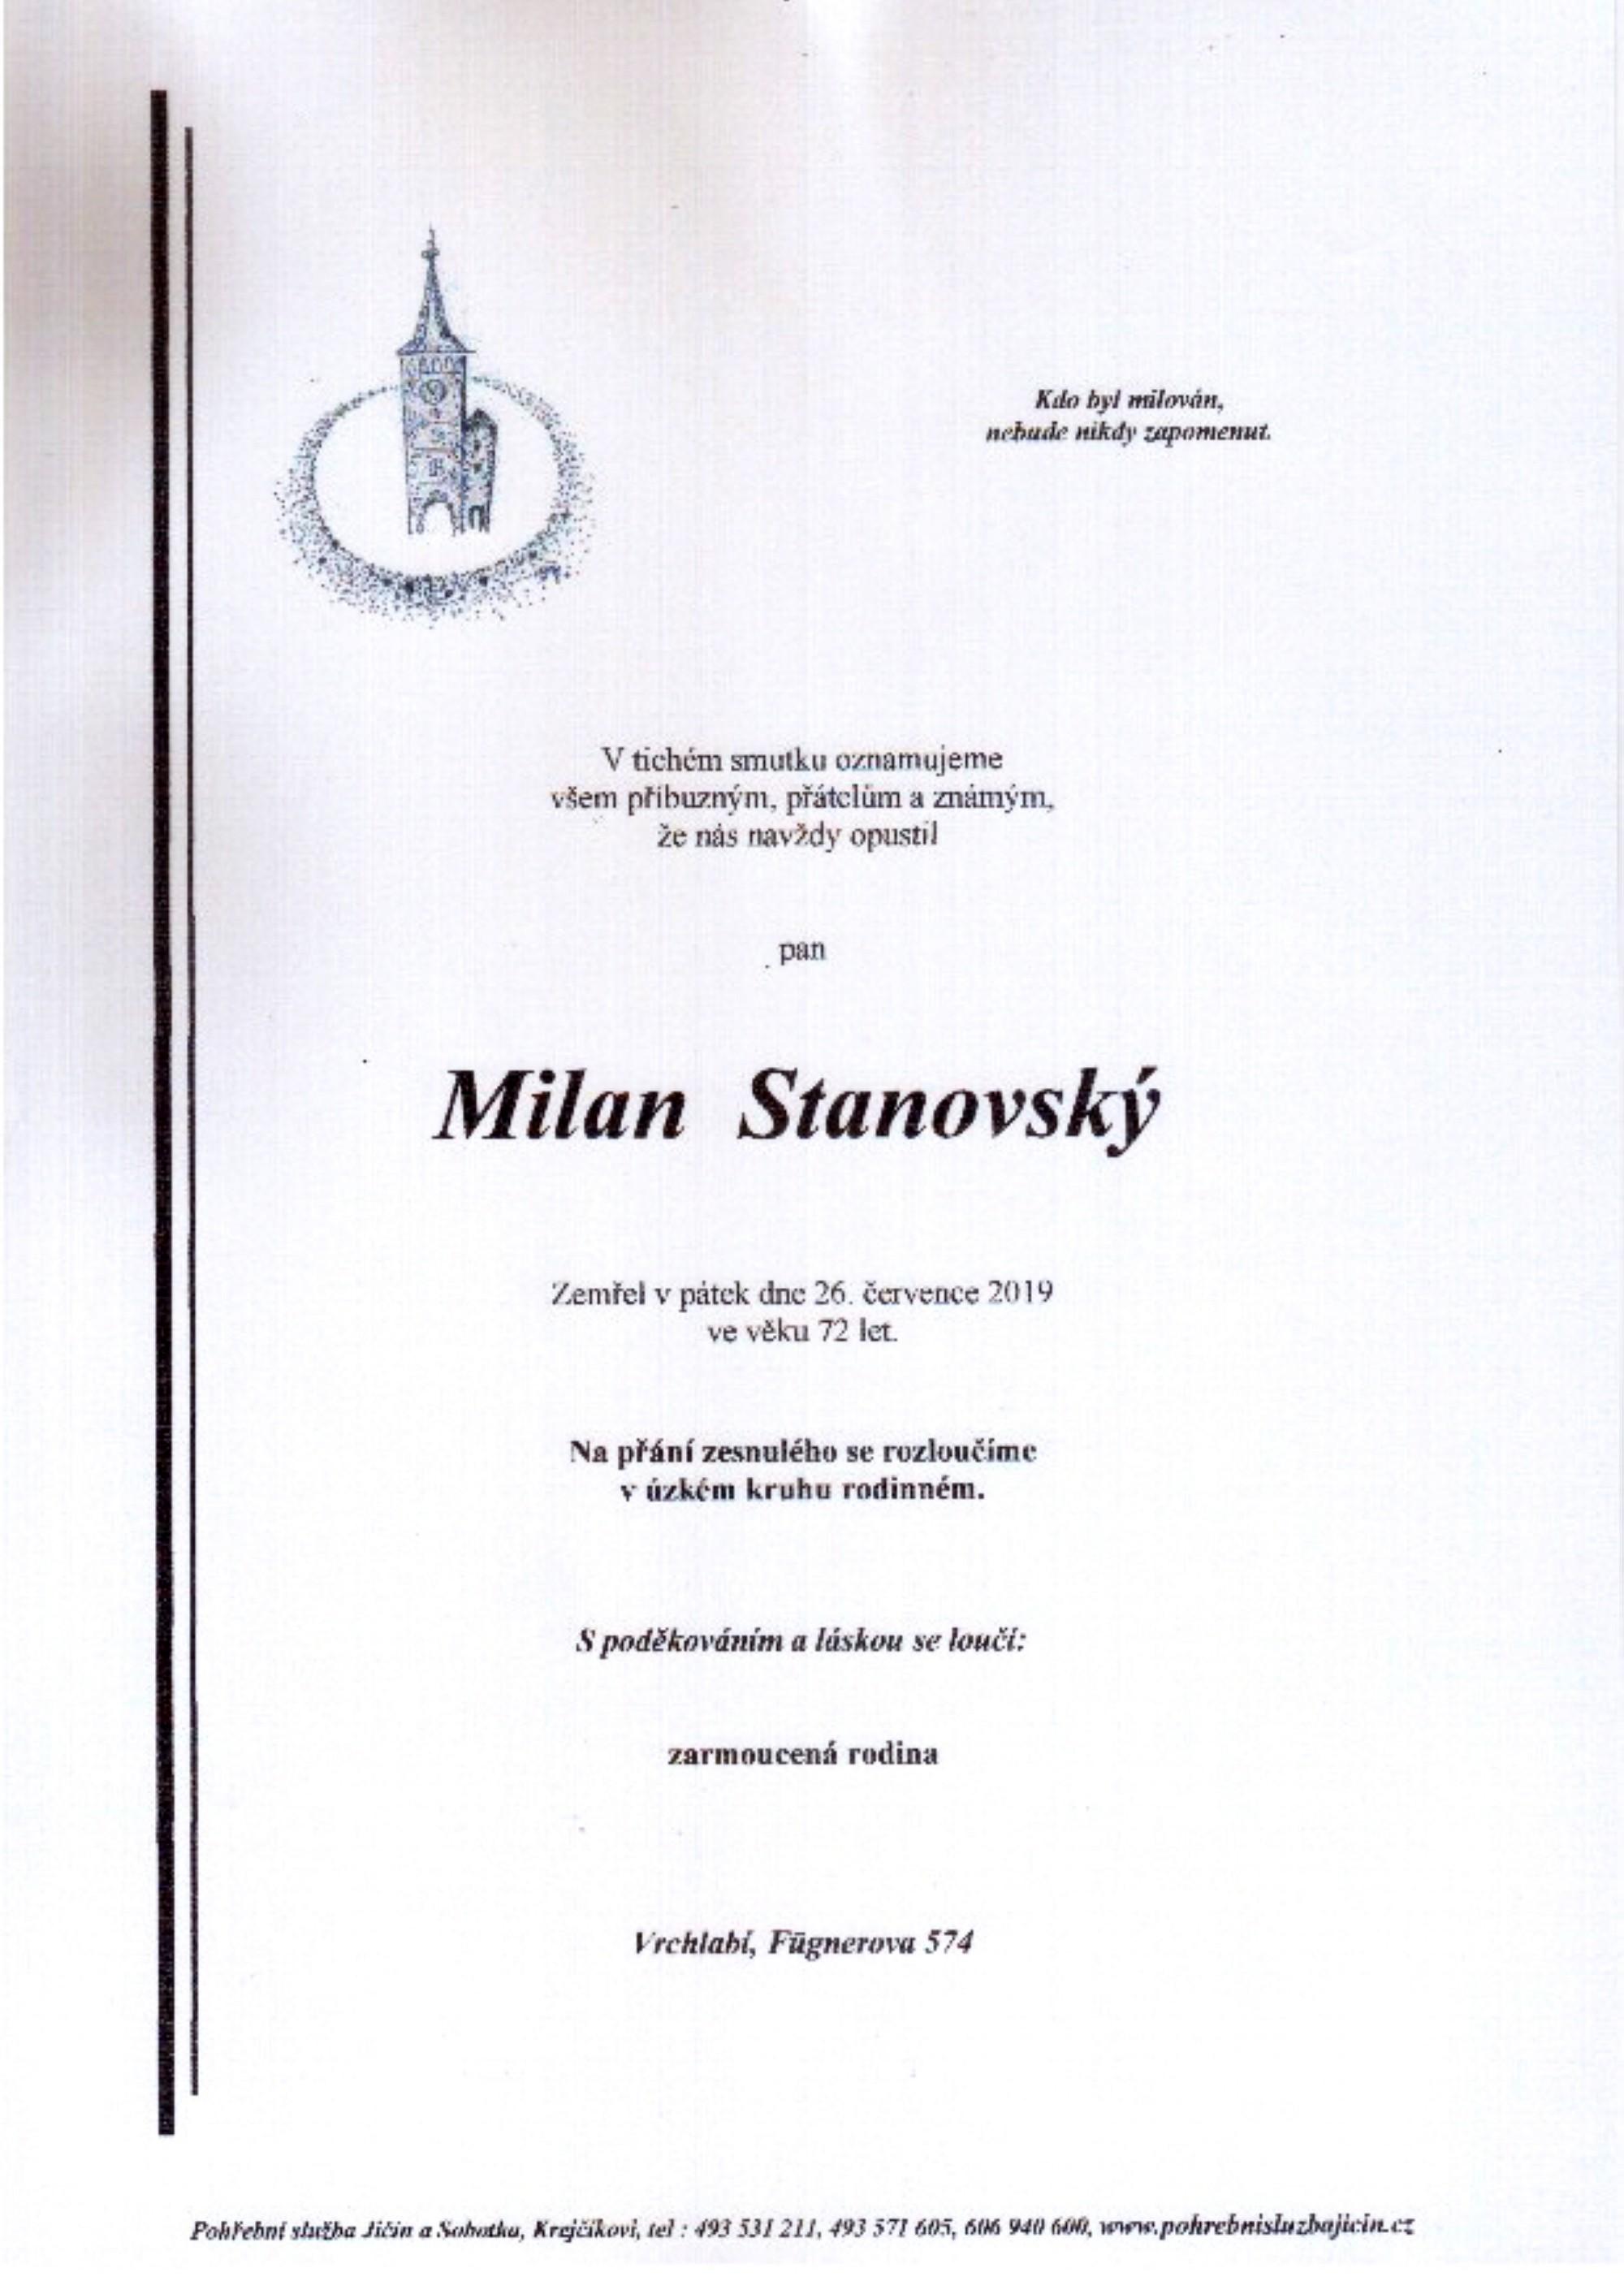 Milan Stanovský